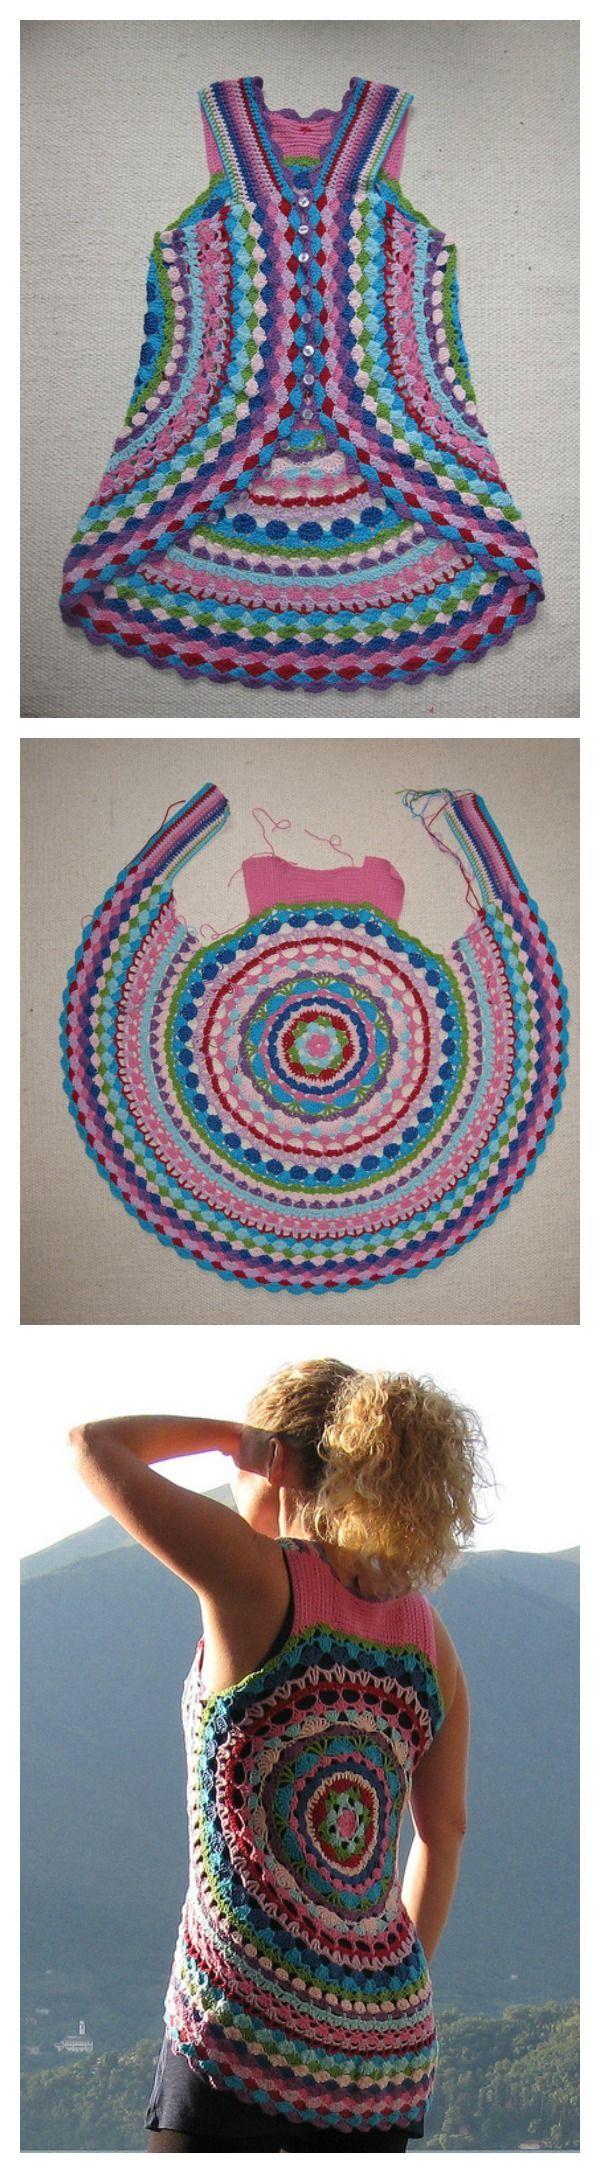 Crochet Pretty Circle Jacket with Pattern   Patrones para blusas ...